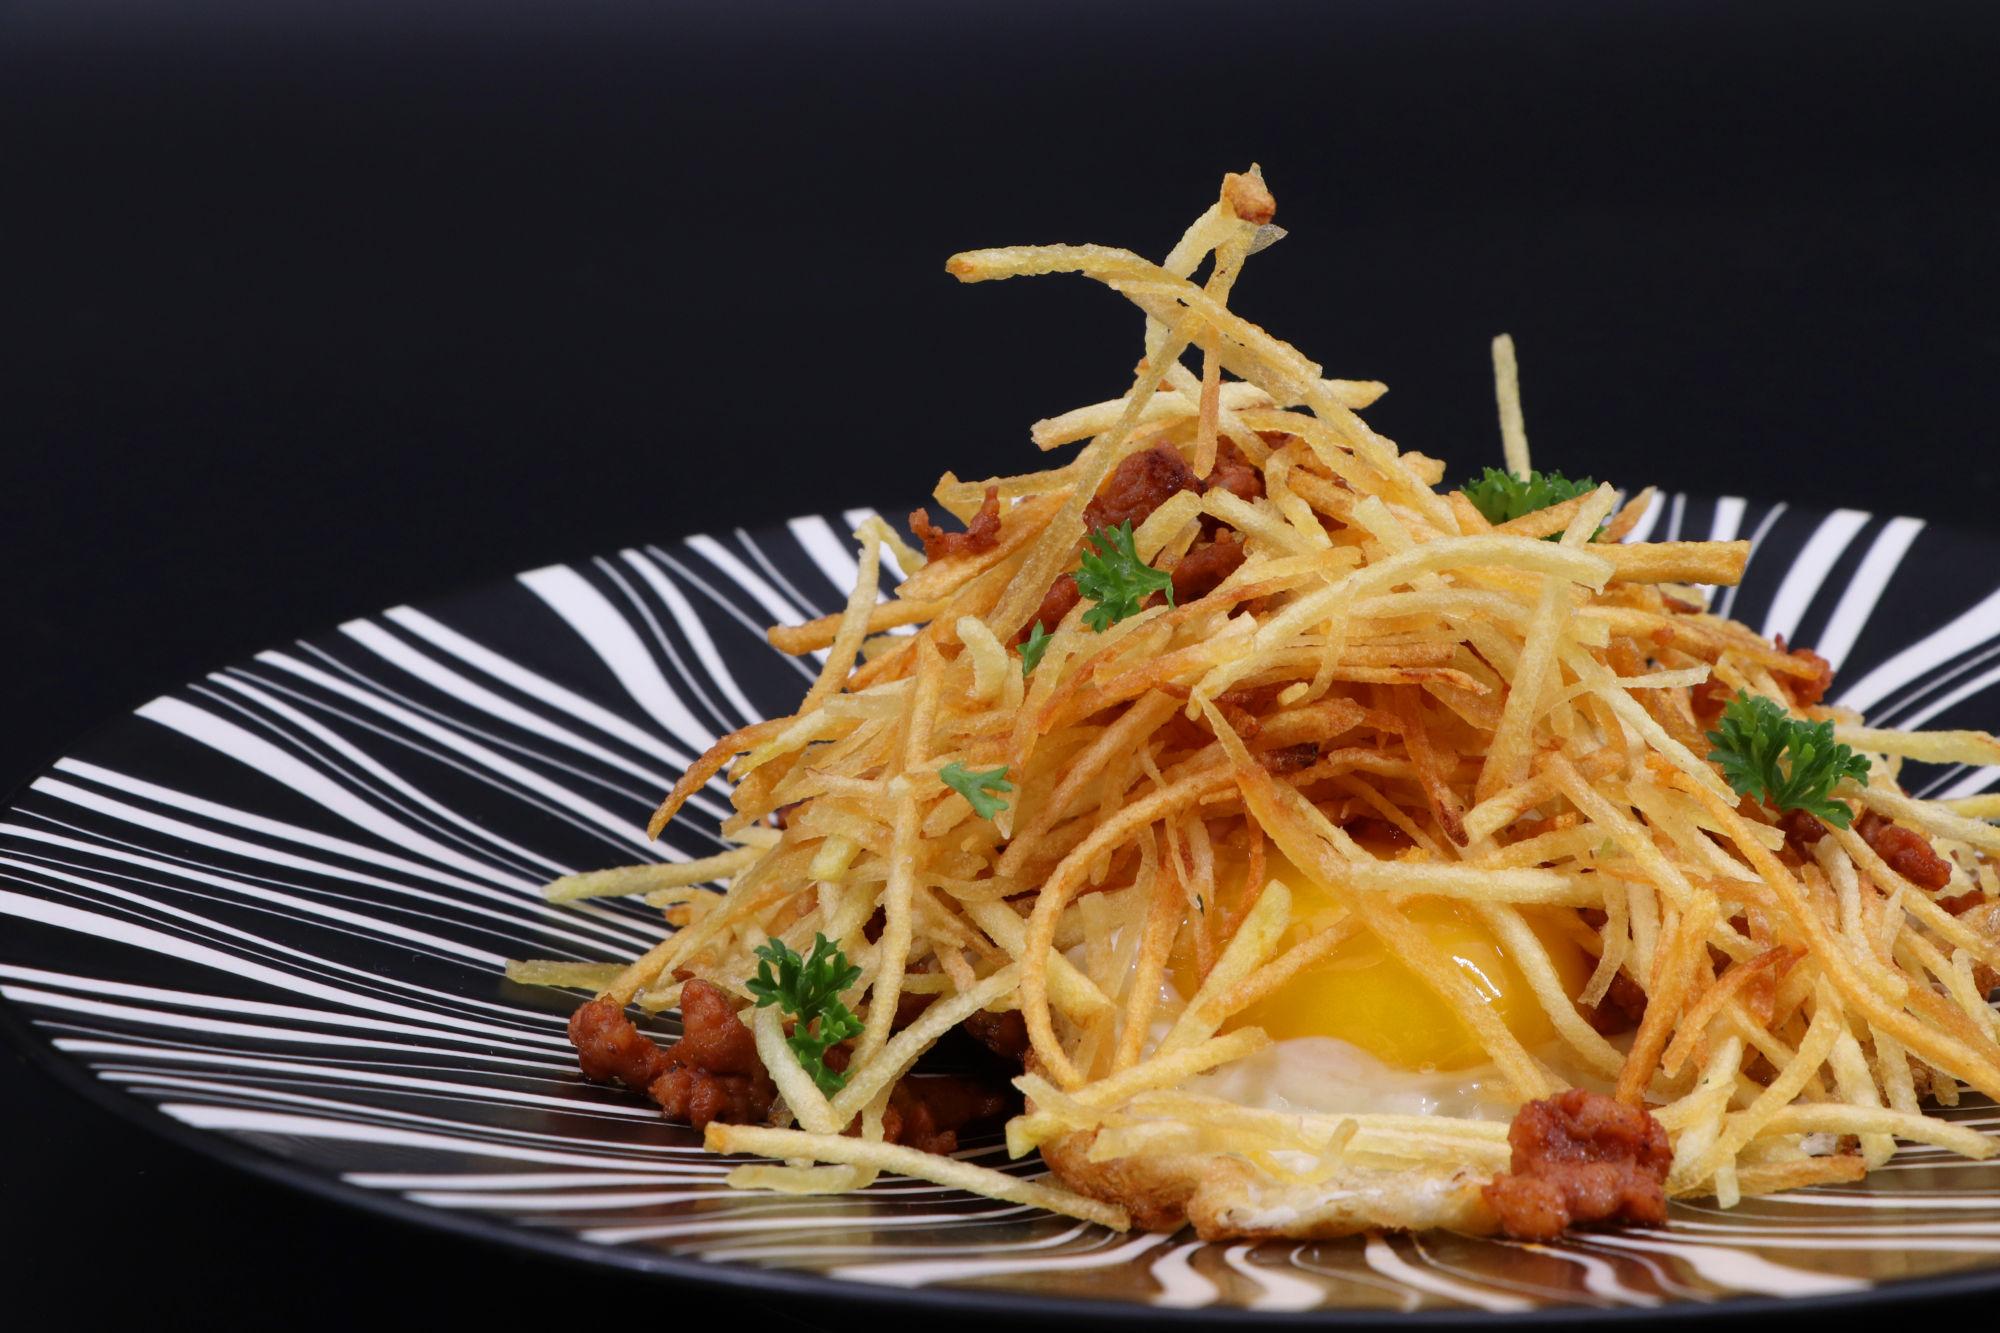 Sofitel Macau At Ponte 16 Catalan gastro pub Fried Egg with Potato & Home-Made Chorizo煎蛋配薯仔和自制西班牙腸